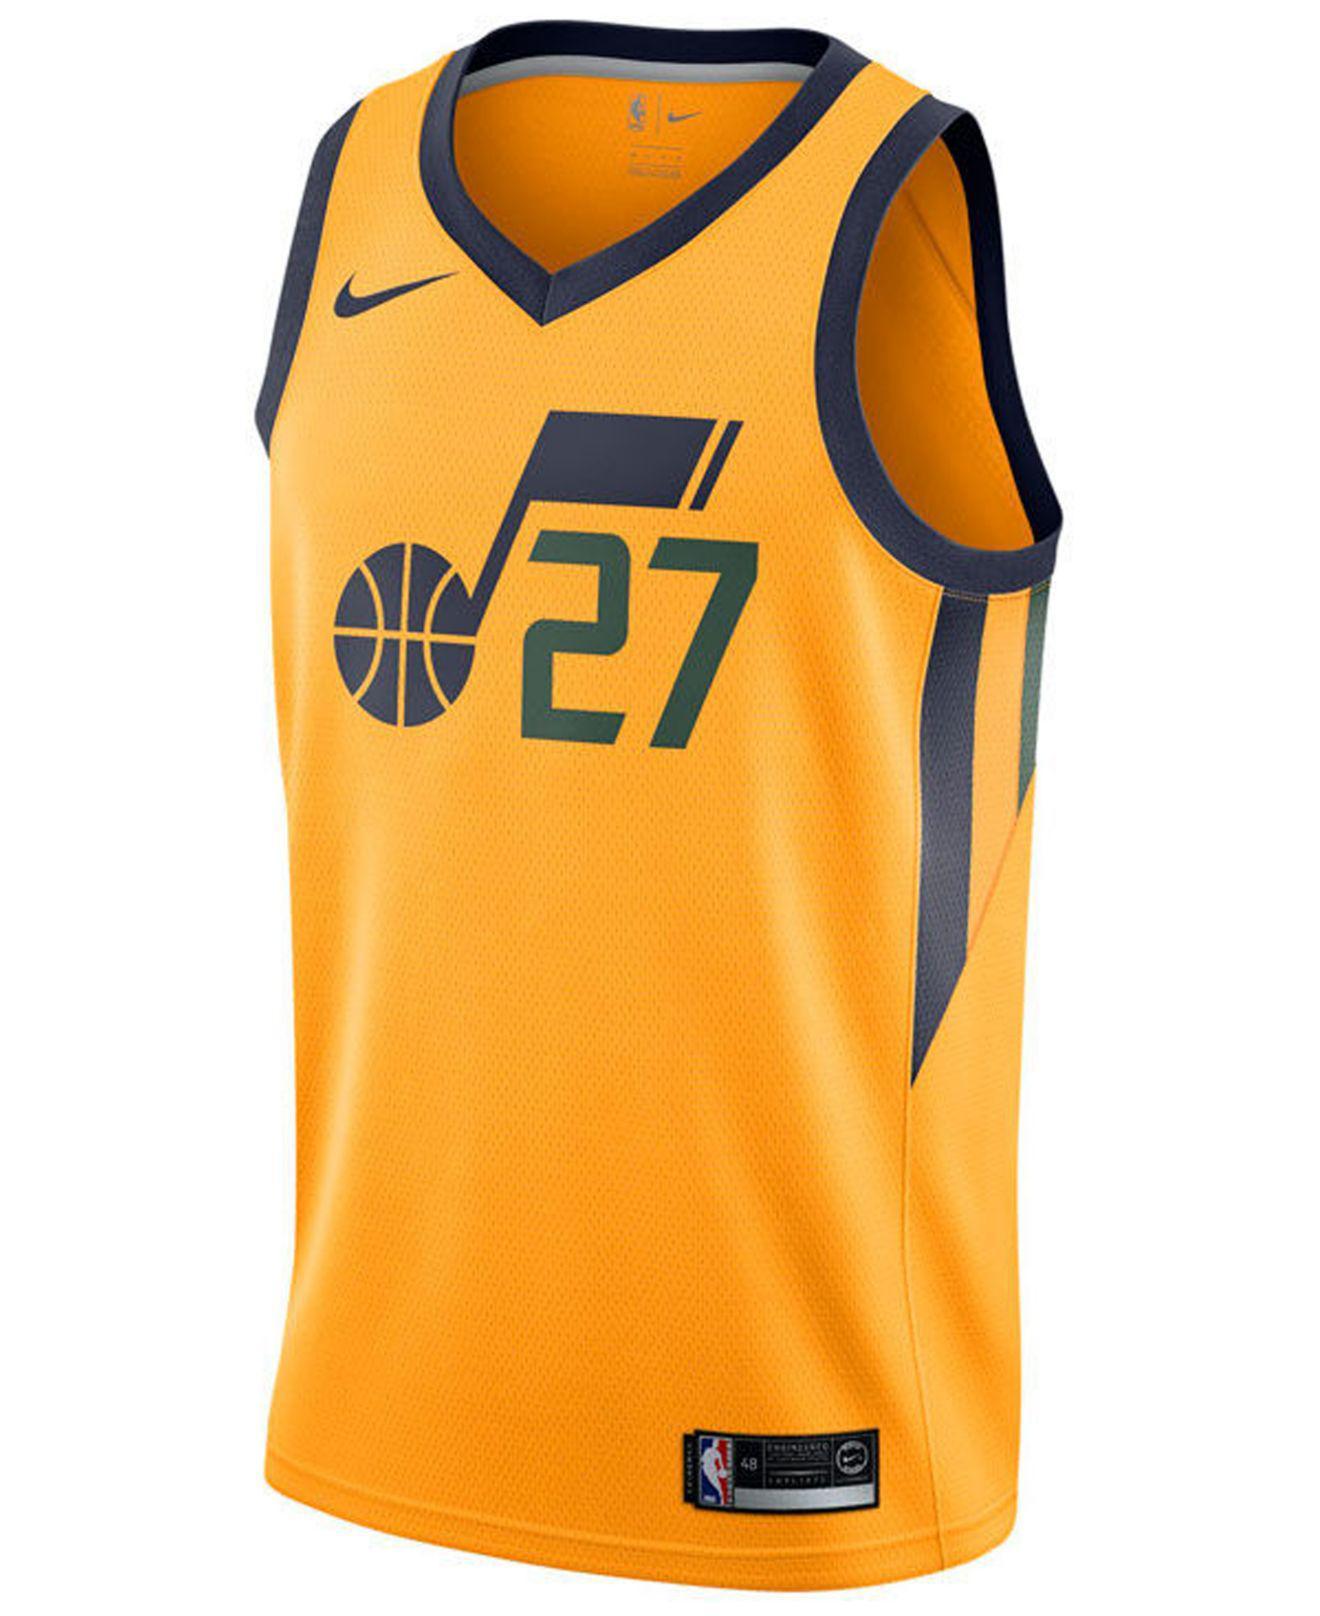 low cost 5c3ab 95d0e Lyst - Nike Rudy Gobert Utah Jazz City Swingman Jersey in ...